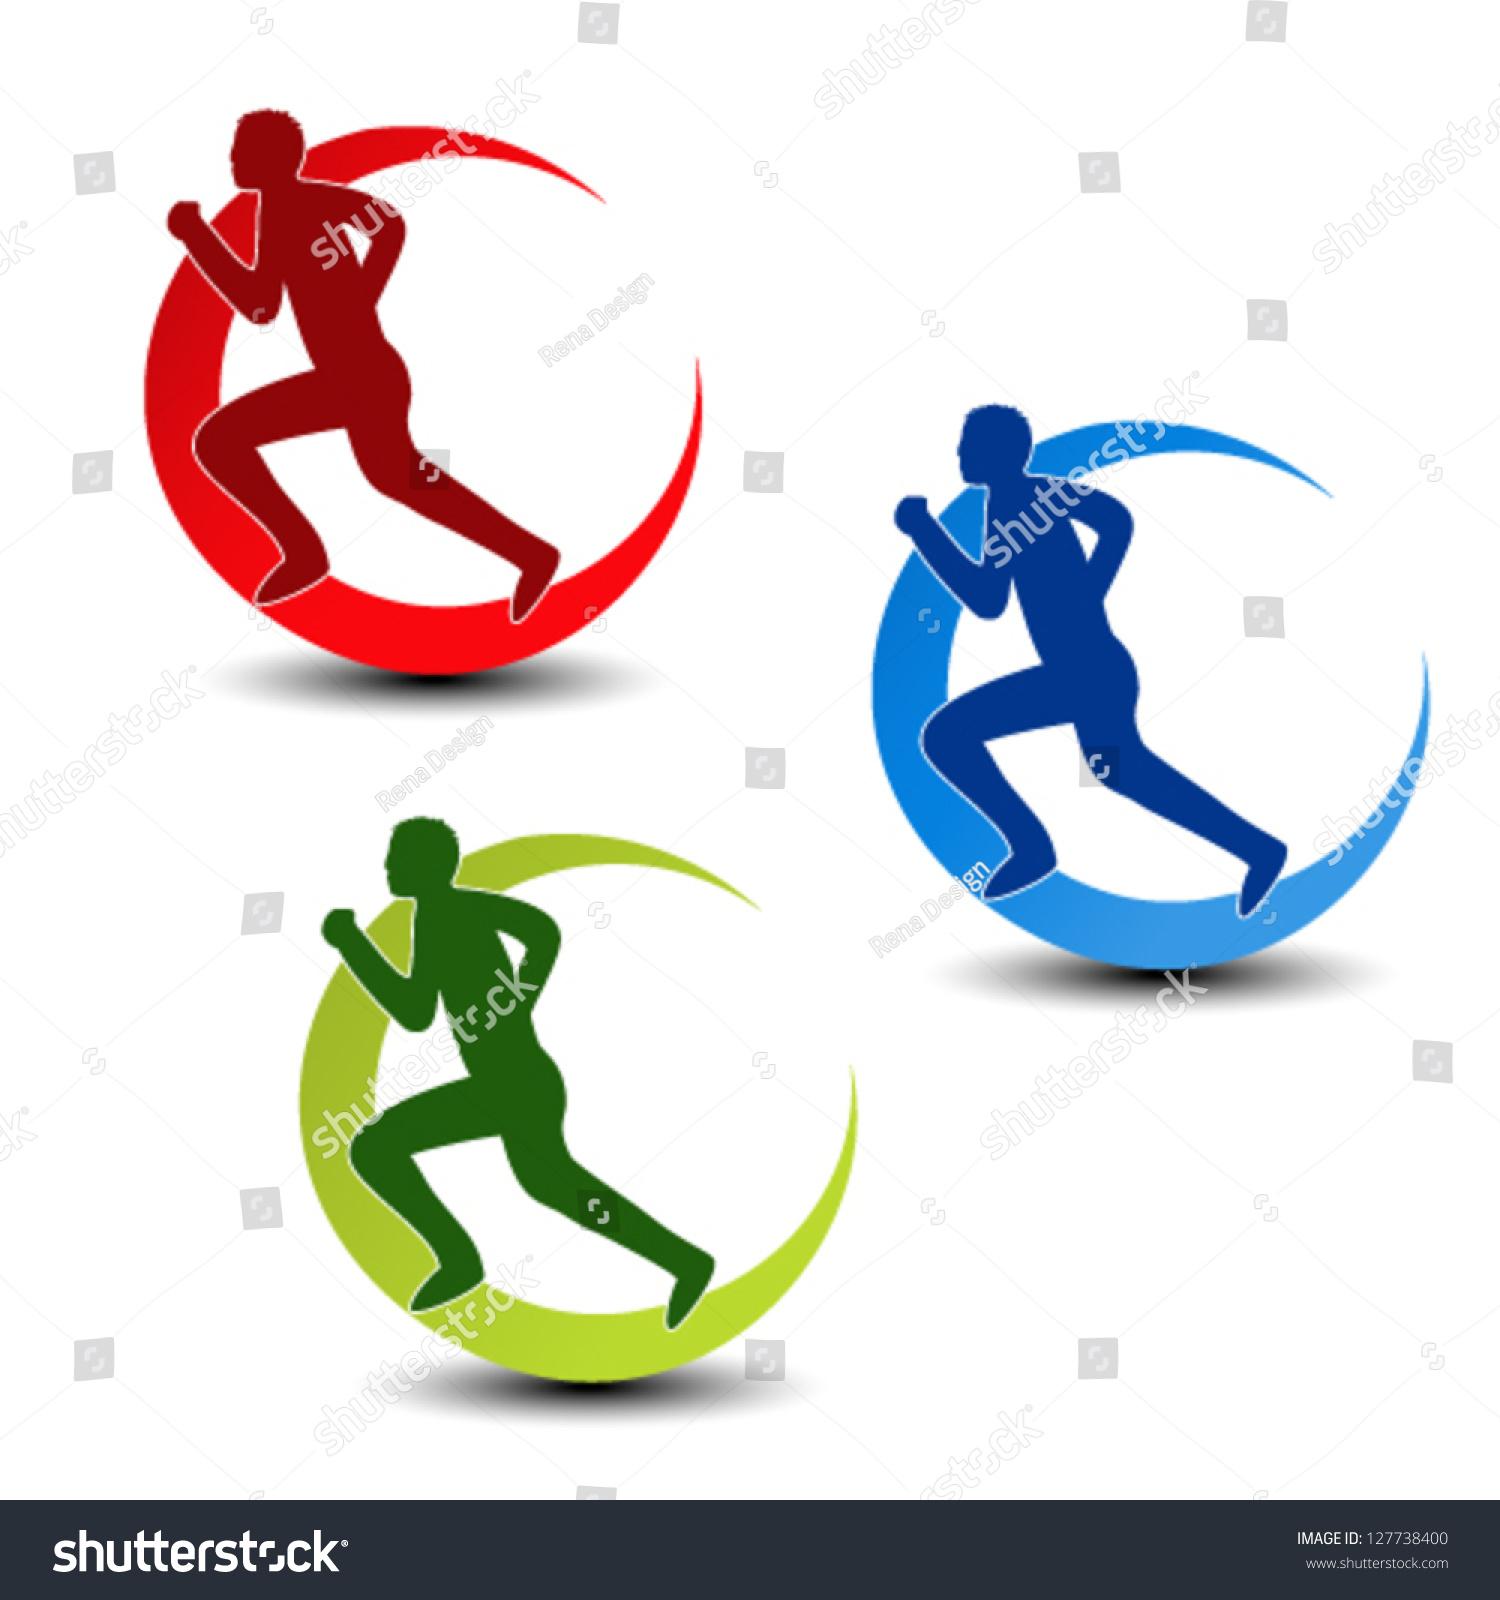 Royalty free vector circular symbol of fitness 127738400 stock vector circular symbol of fitness runner silhouette sport symbol icon 127738400 biocorpaavc